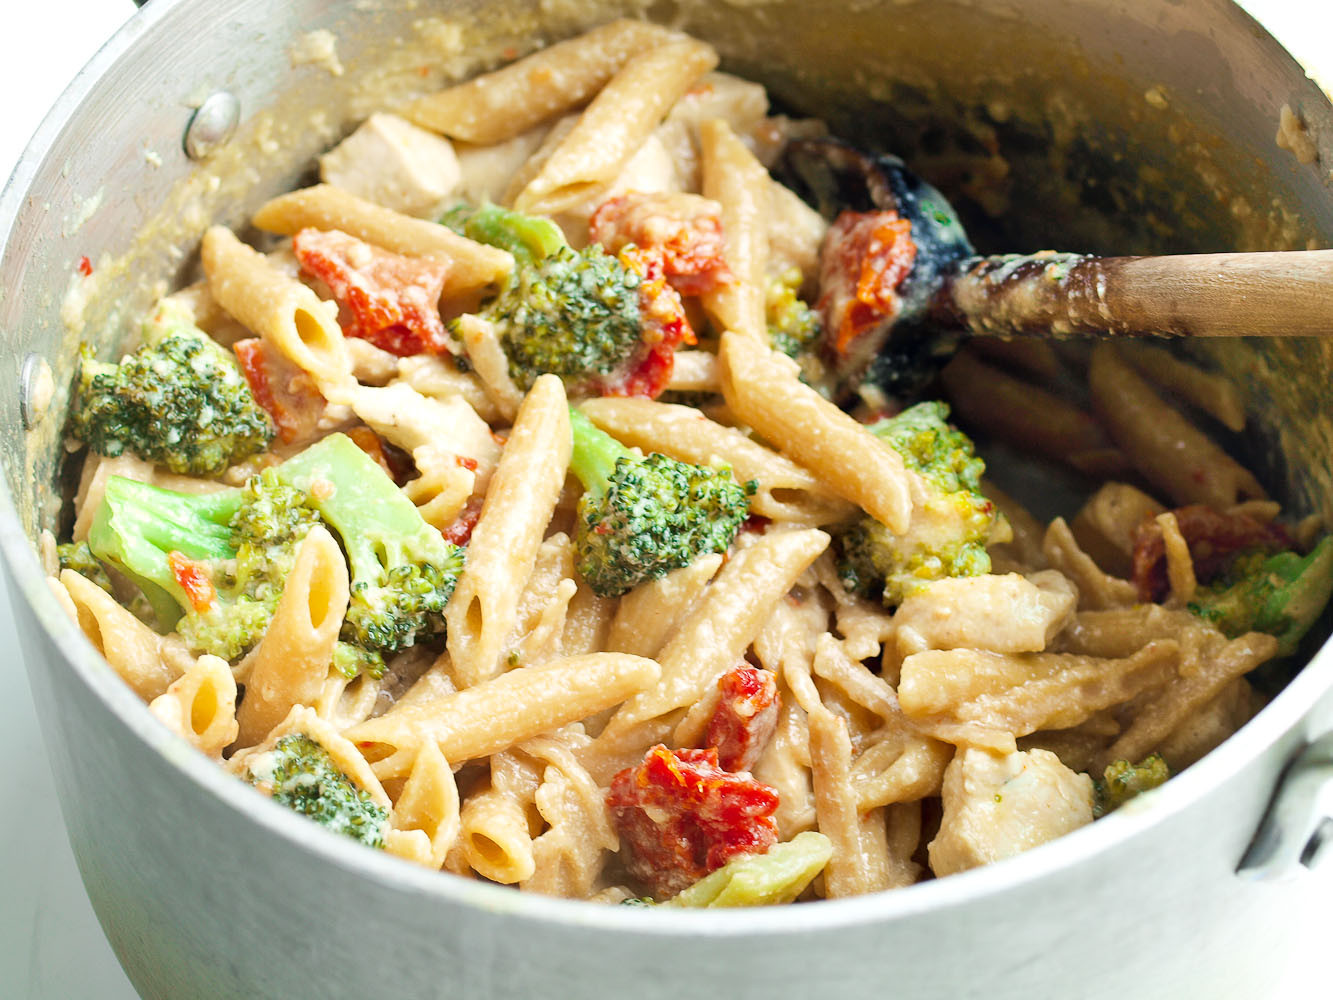 Healthy Dinner For Kids  Tangy e Pot Chicken and Veggie Pasta Dinner